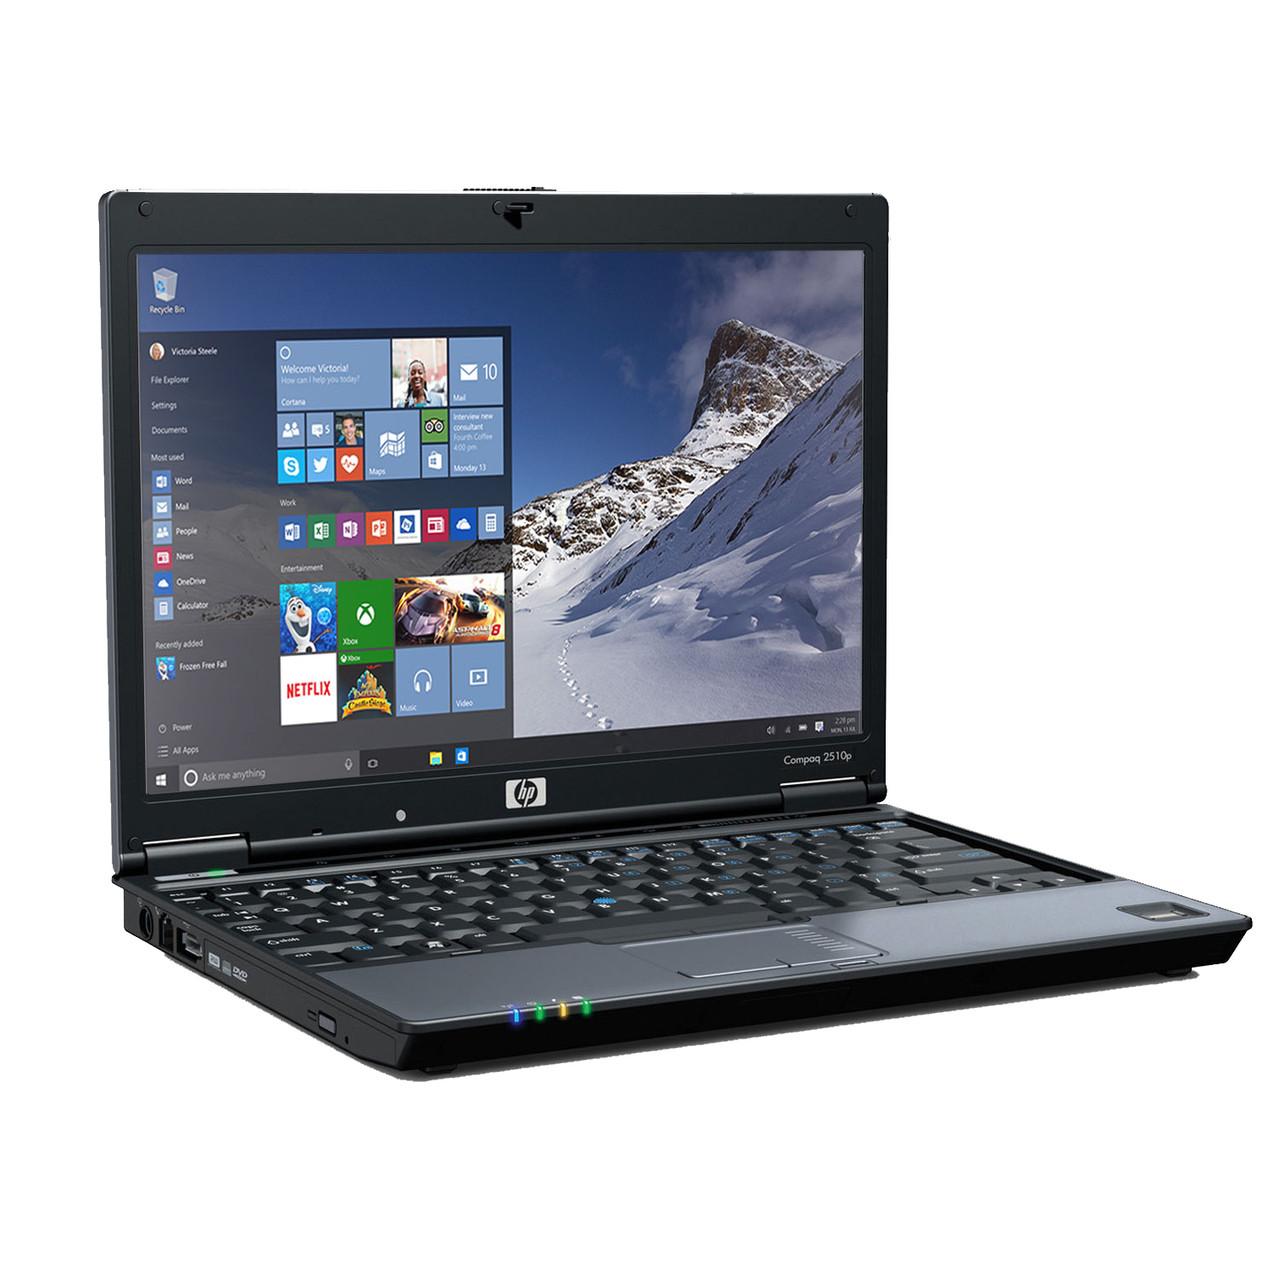 refurbished hp elitebook 2510p core 2 duo laptop on sale rh kelsusit com hp 2510p user manual HP Pavilion Desktop Manuals